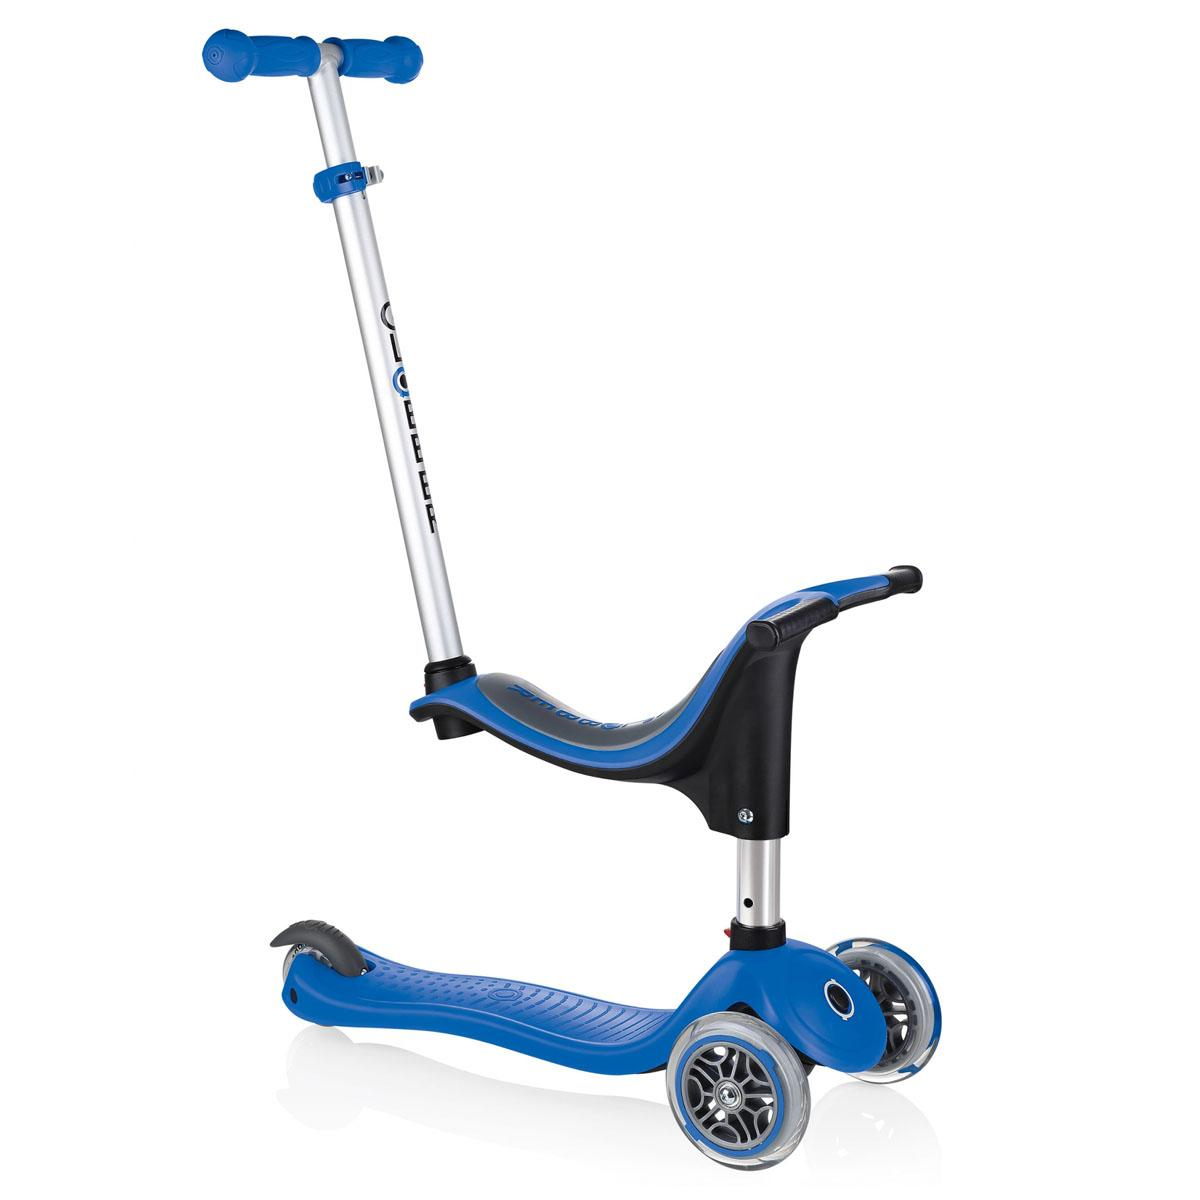 Xe trượt scooter Globber My Free Seat 4 in 1 (EVO 4 in 1) - Xanh da trời